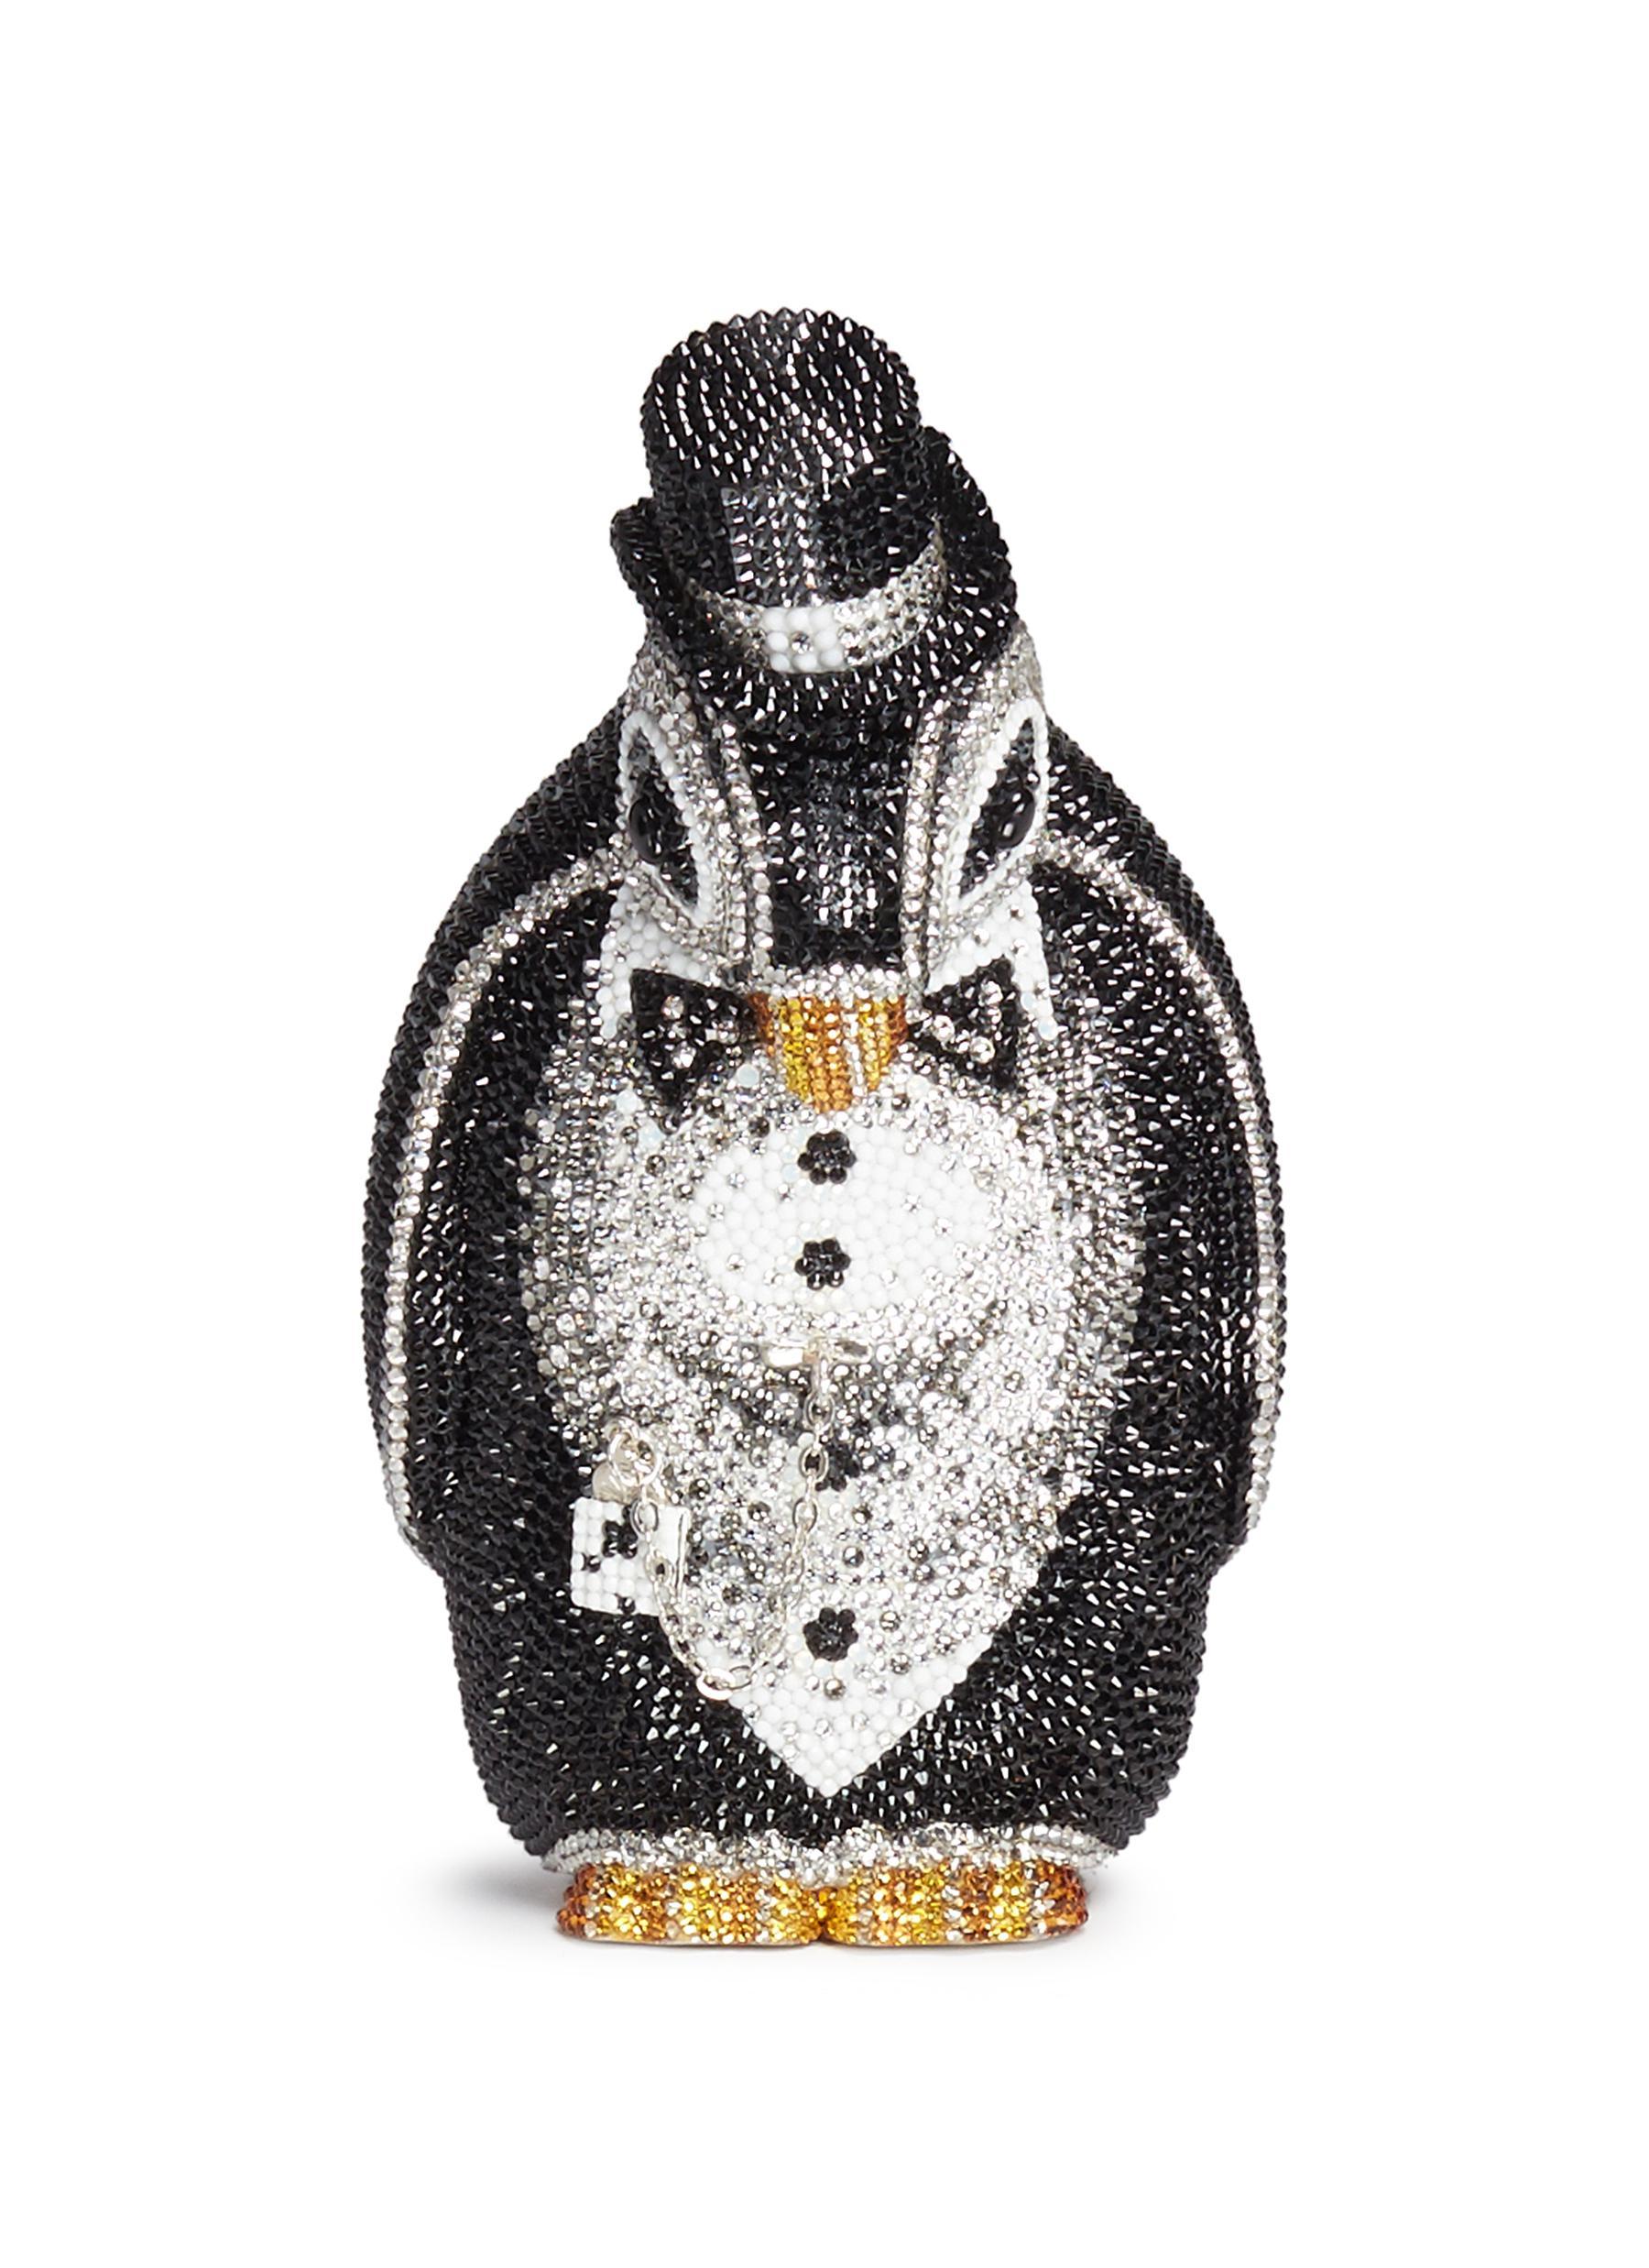 Penguin Alfred crystal pavé minaudière by Judith Leiber